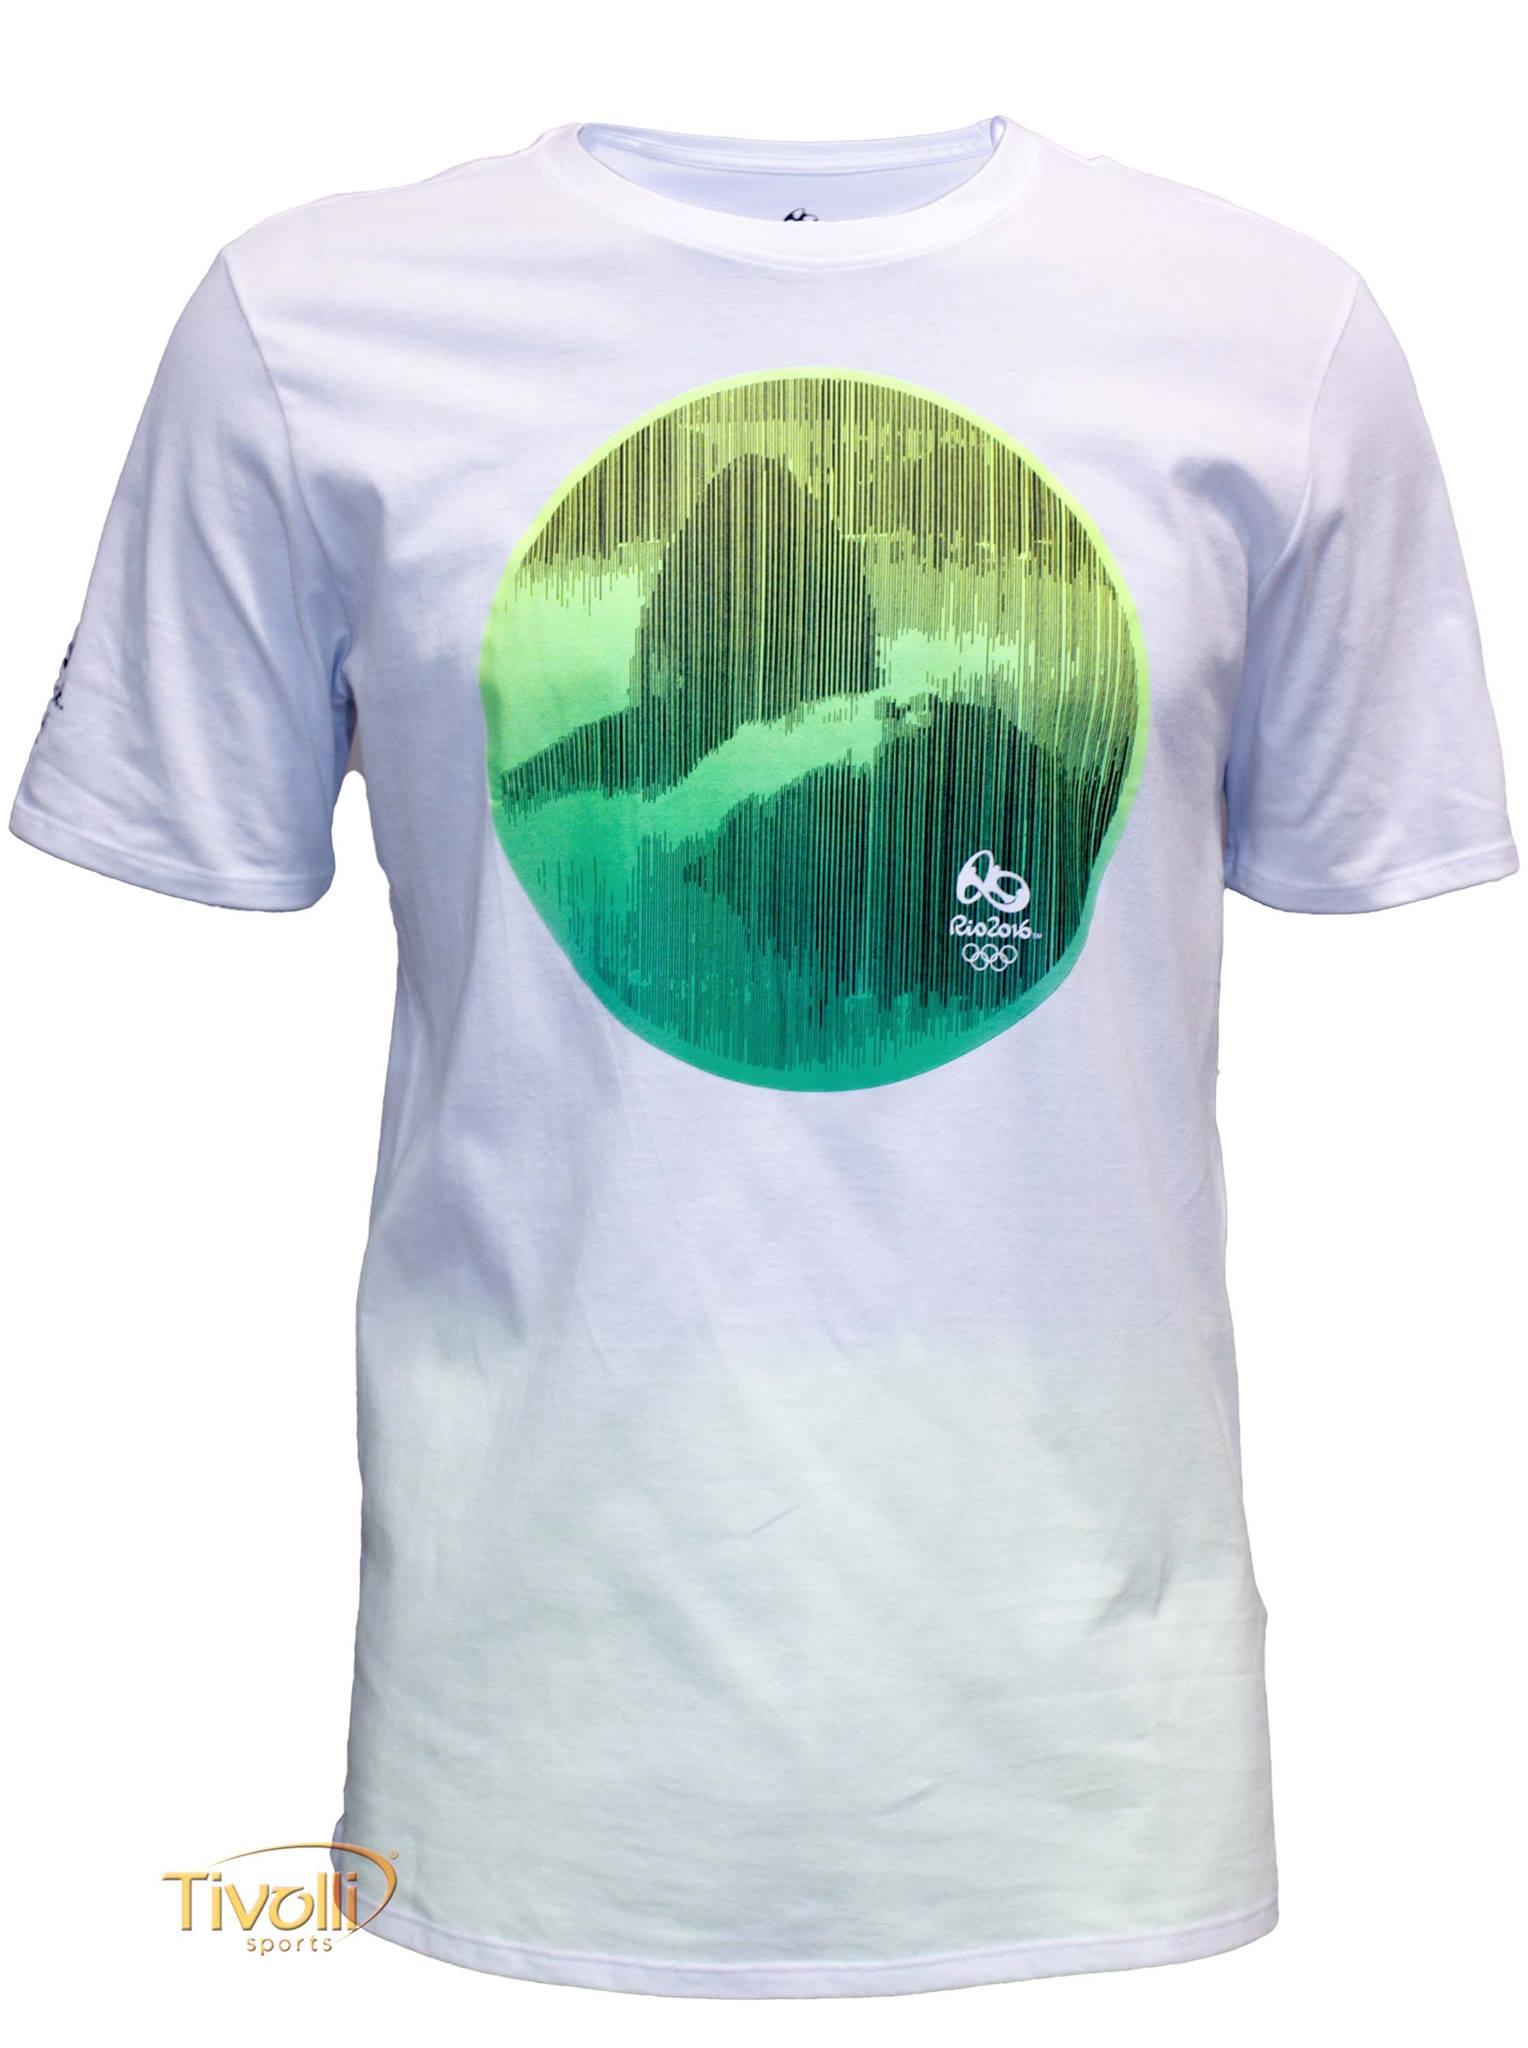 8e8ac4f6e7 Camiseta Nike Rio 2016 Sportswear   Branca